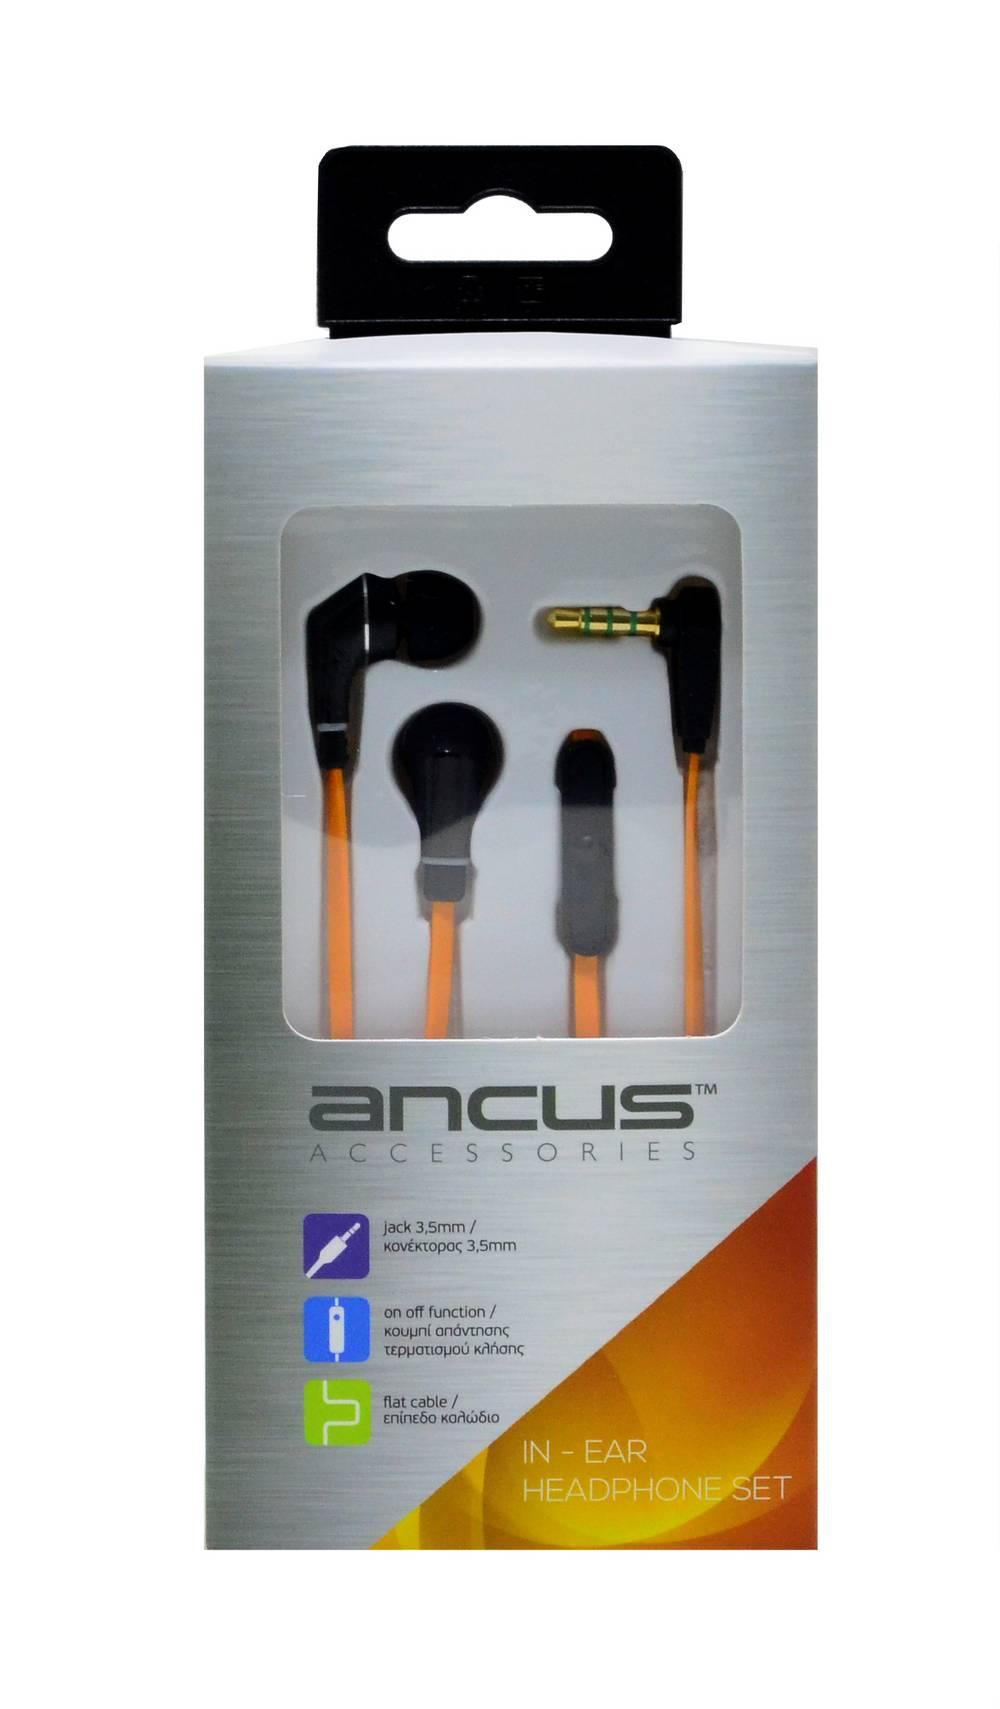 Hands Free Ancus Loop in-Earbud Stereo 3.5 mm για Apple-Samsung-HTC-Sony Πορτοκαλί με Καλώδιο Πλακέ, Πλήκτρο Απάντησης